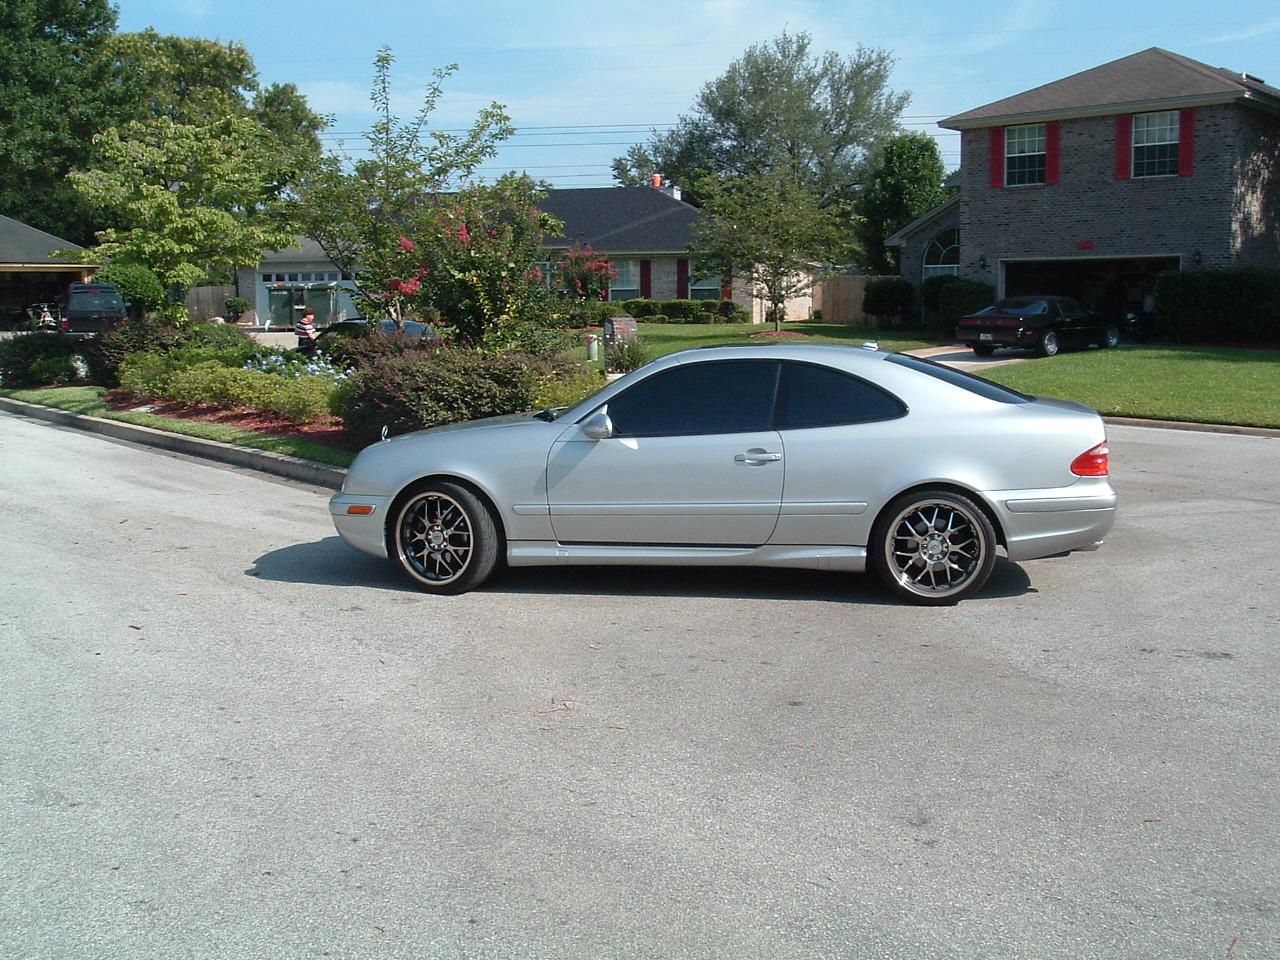 Widest tires that fit on 2001 clk 430? - Mercedes-Benz Forum